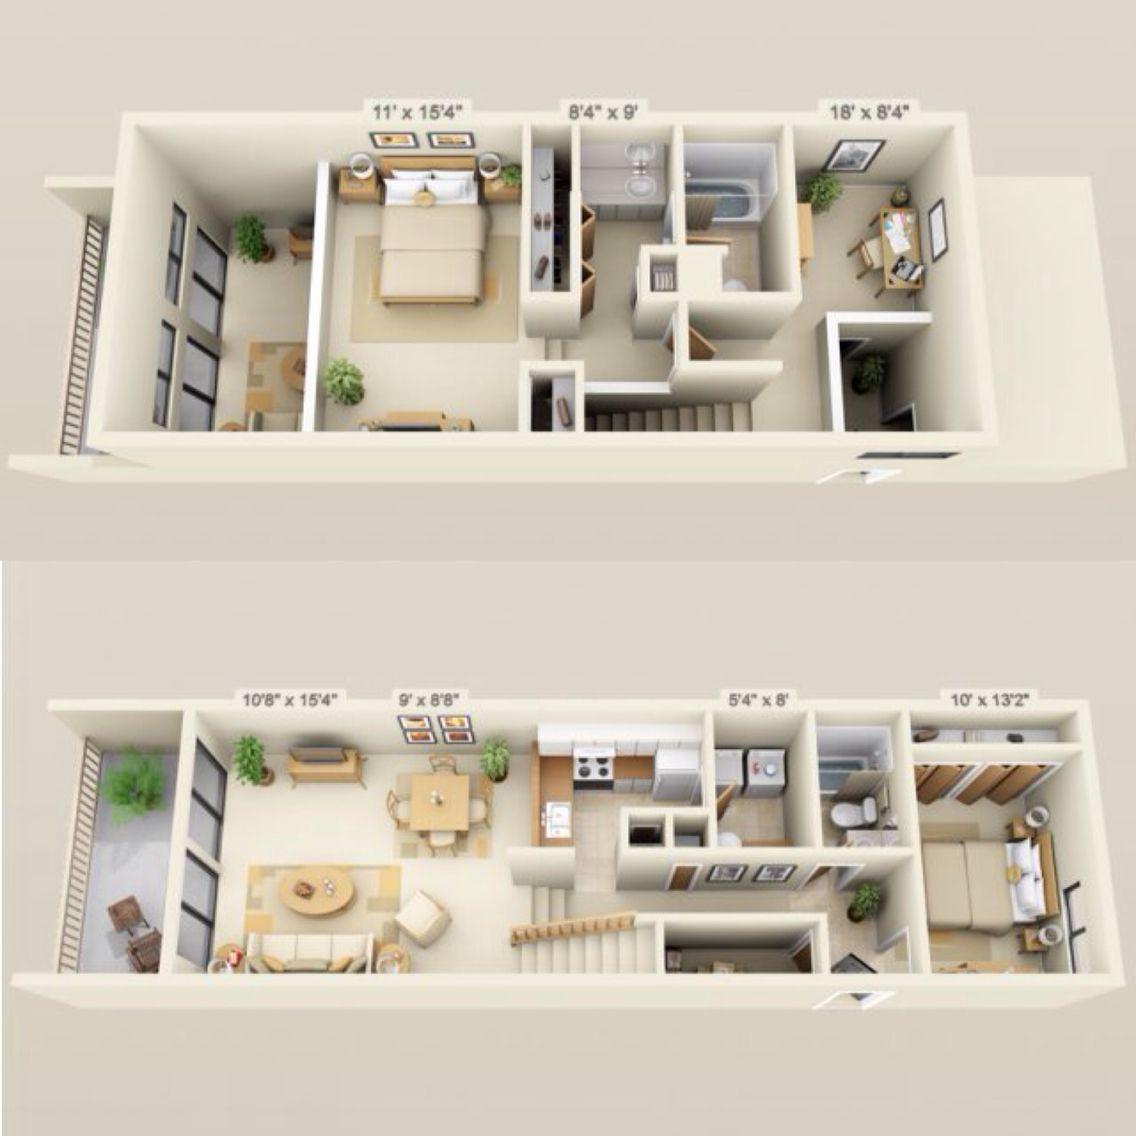 920 935 Rent 200 Dep 2 Beds 2 Baths 1285 Sq Feet Small House Design Apartment Floor Plans House Plans